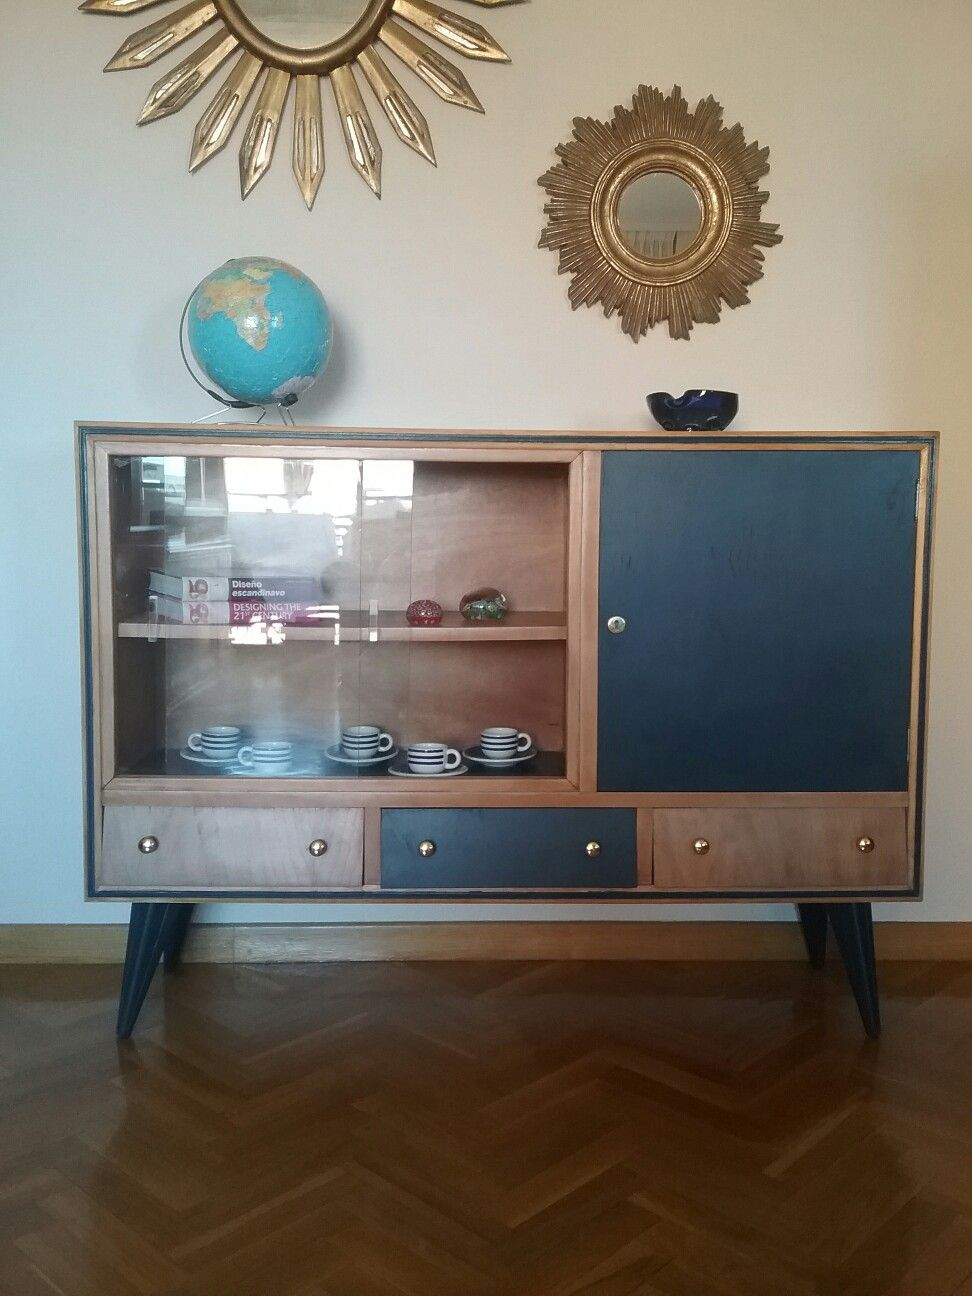 Aparador mueble bar circa a os 50 restaurado por style - Muebles anos 50 madrid ...